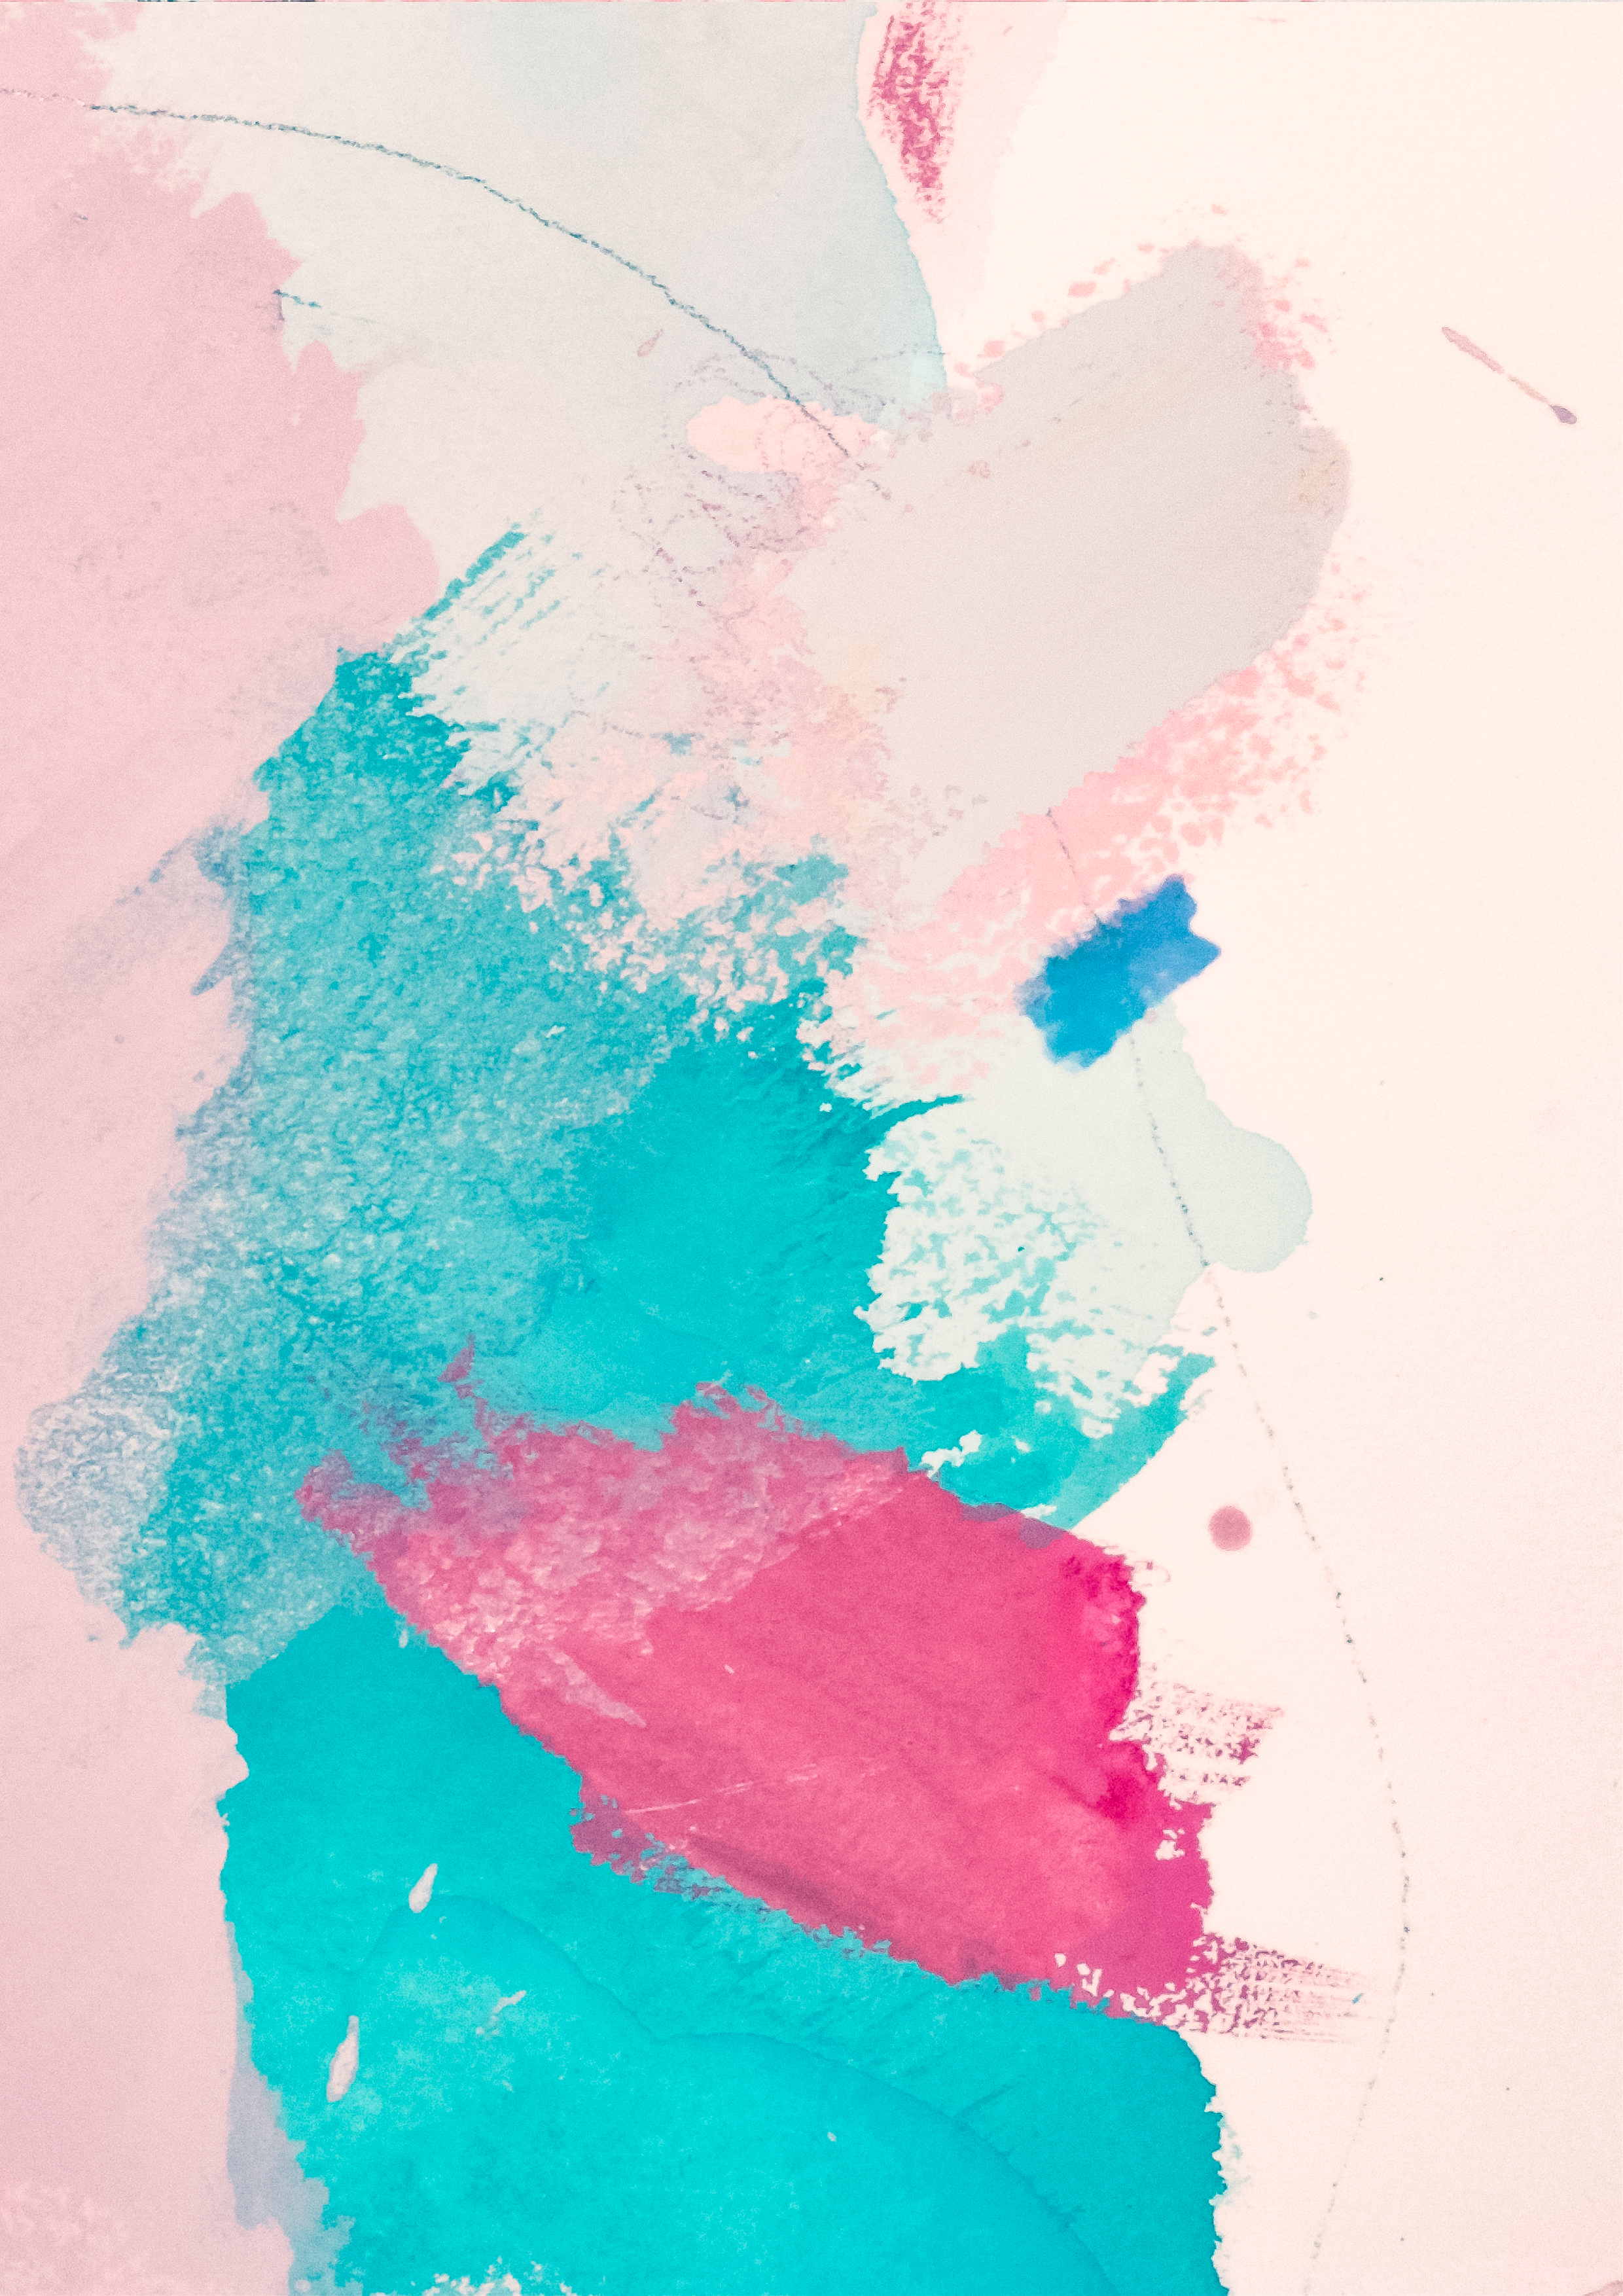 Freeing SHe - Creative Musings + Writings